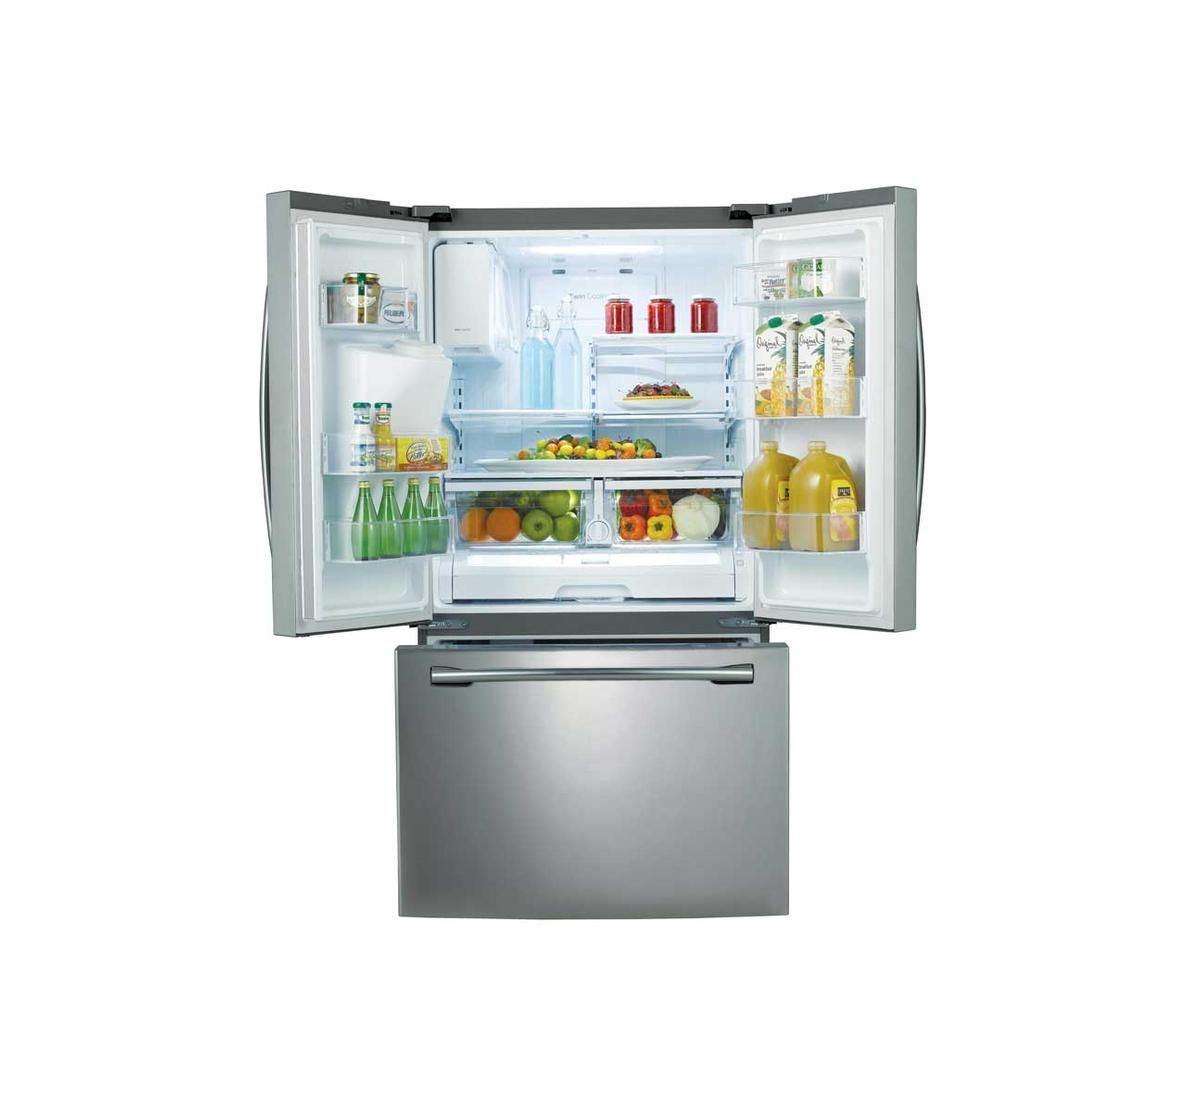 Samsung French Door Refrigerator Badcock More